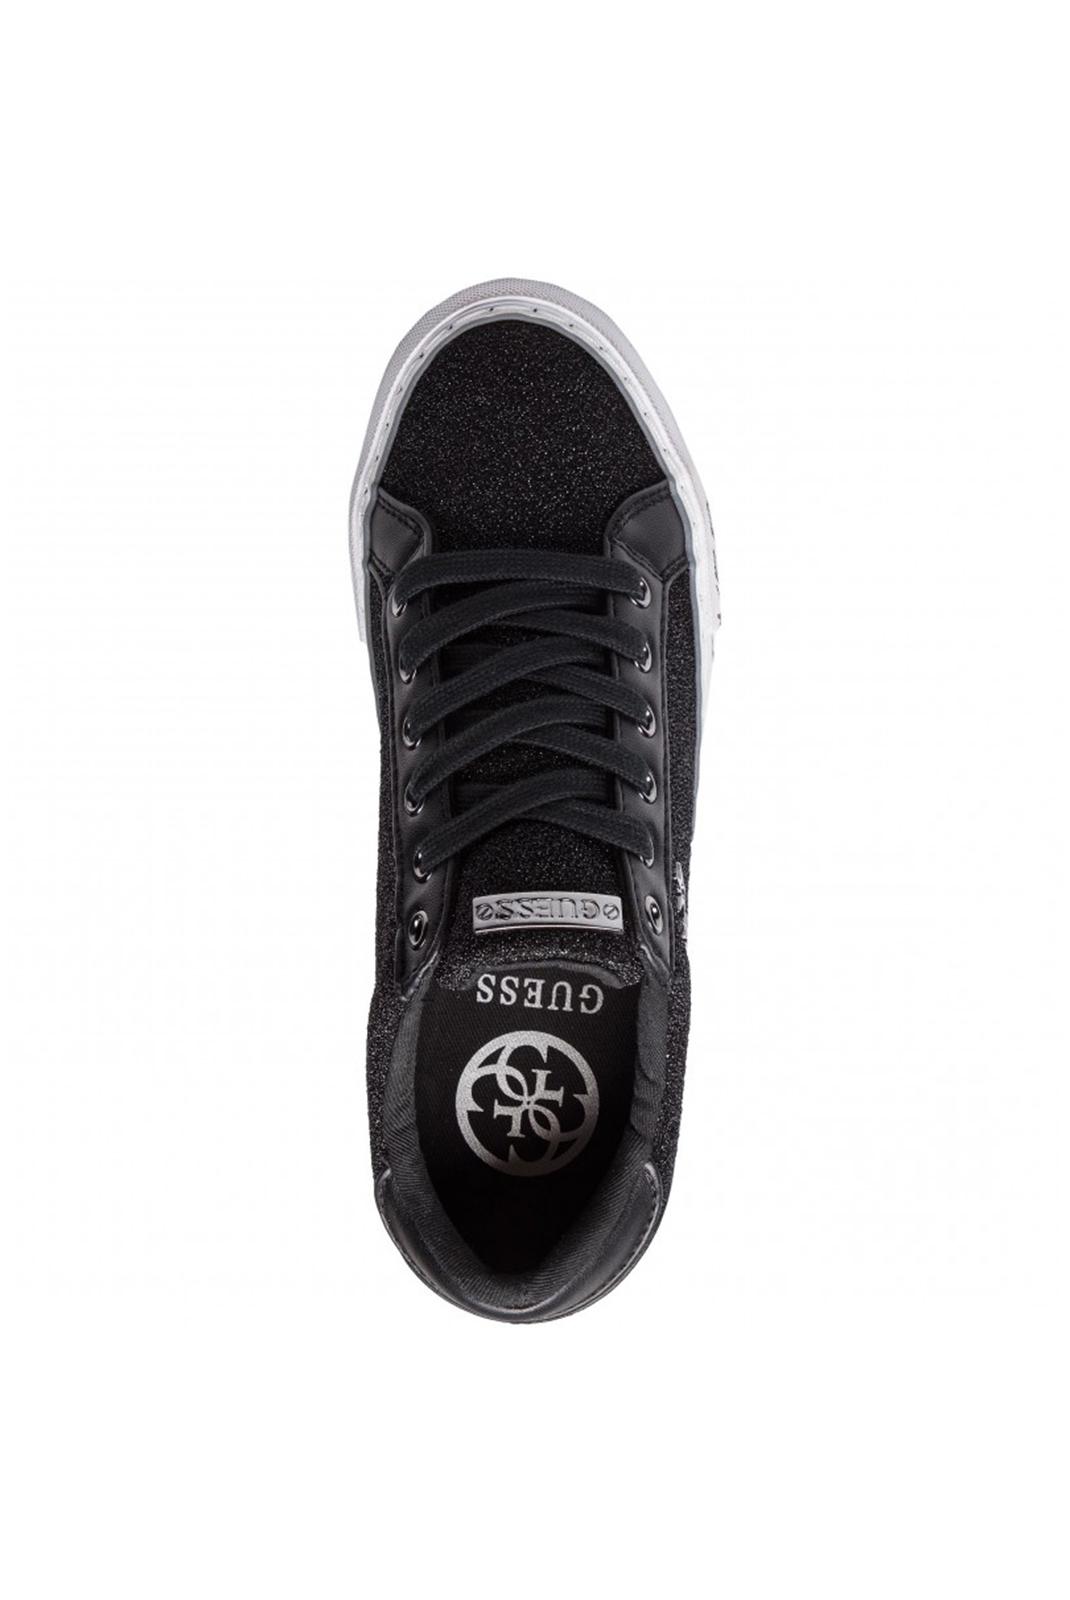 Baskets / Sneakers  Guess jeans FLPRE4 FAM12 BLACK